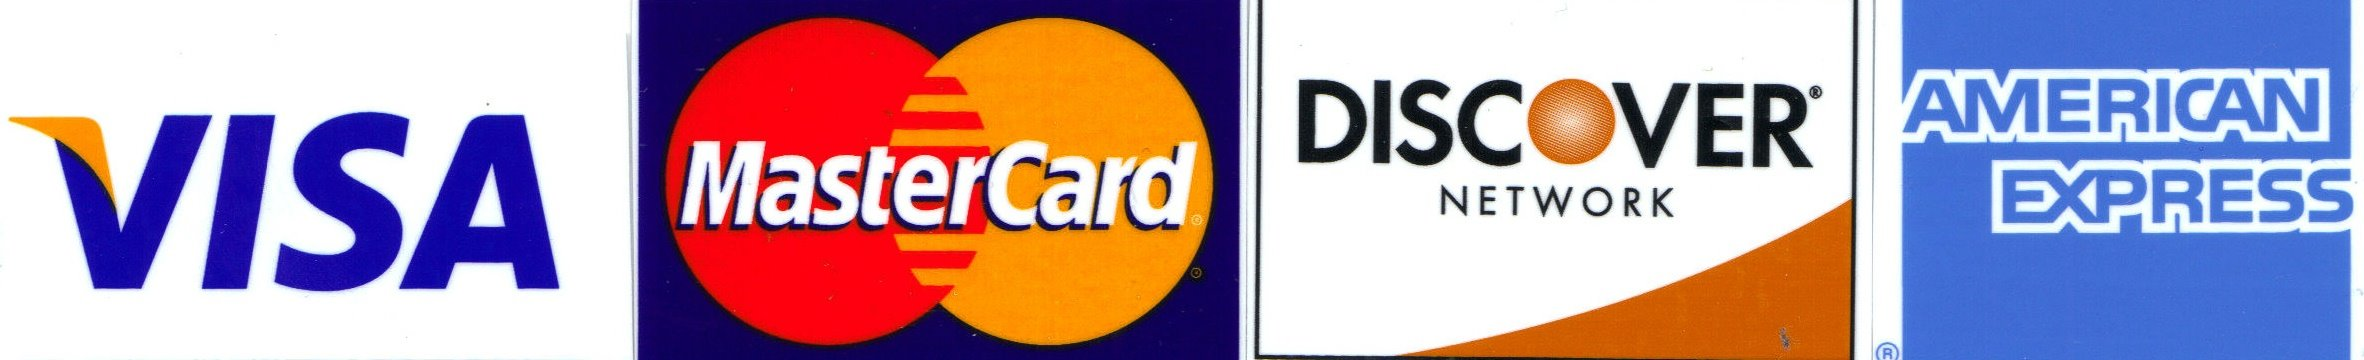 Visa - Mastercard - Discover - American Express